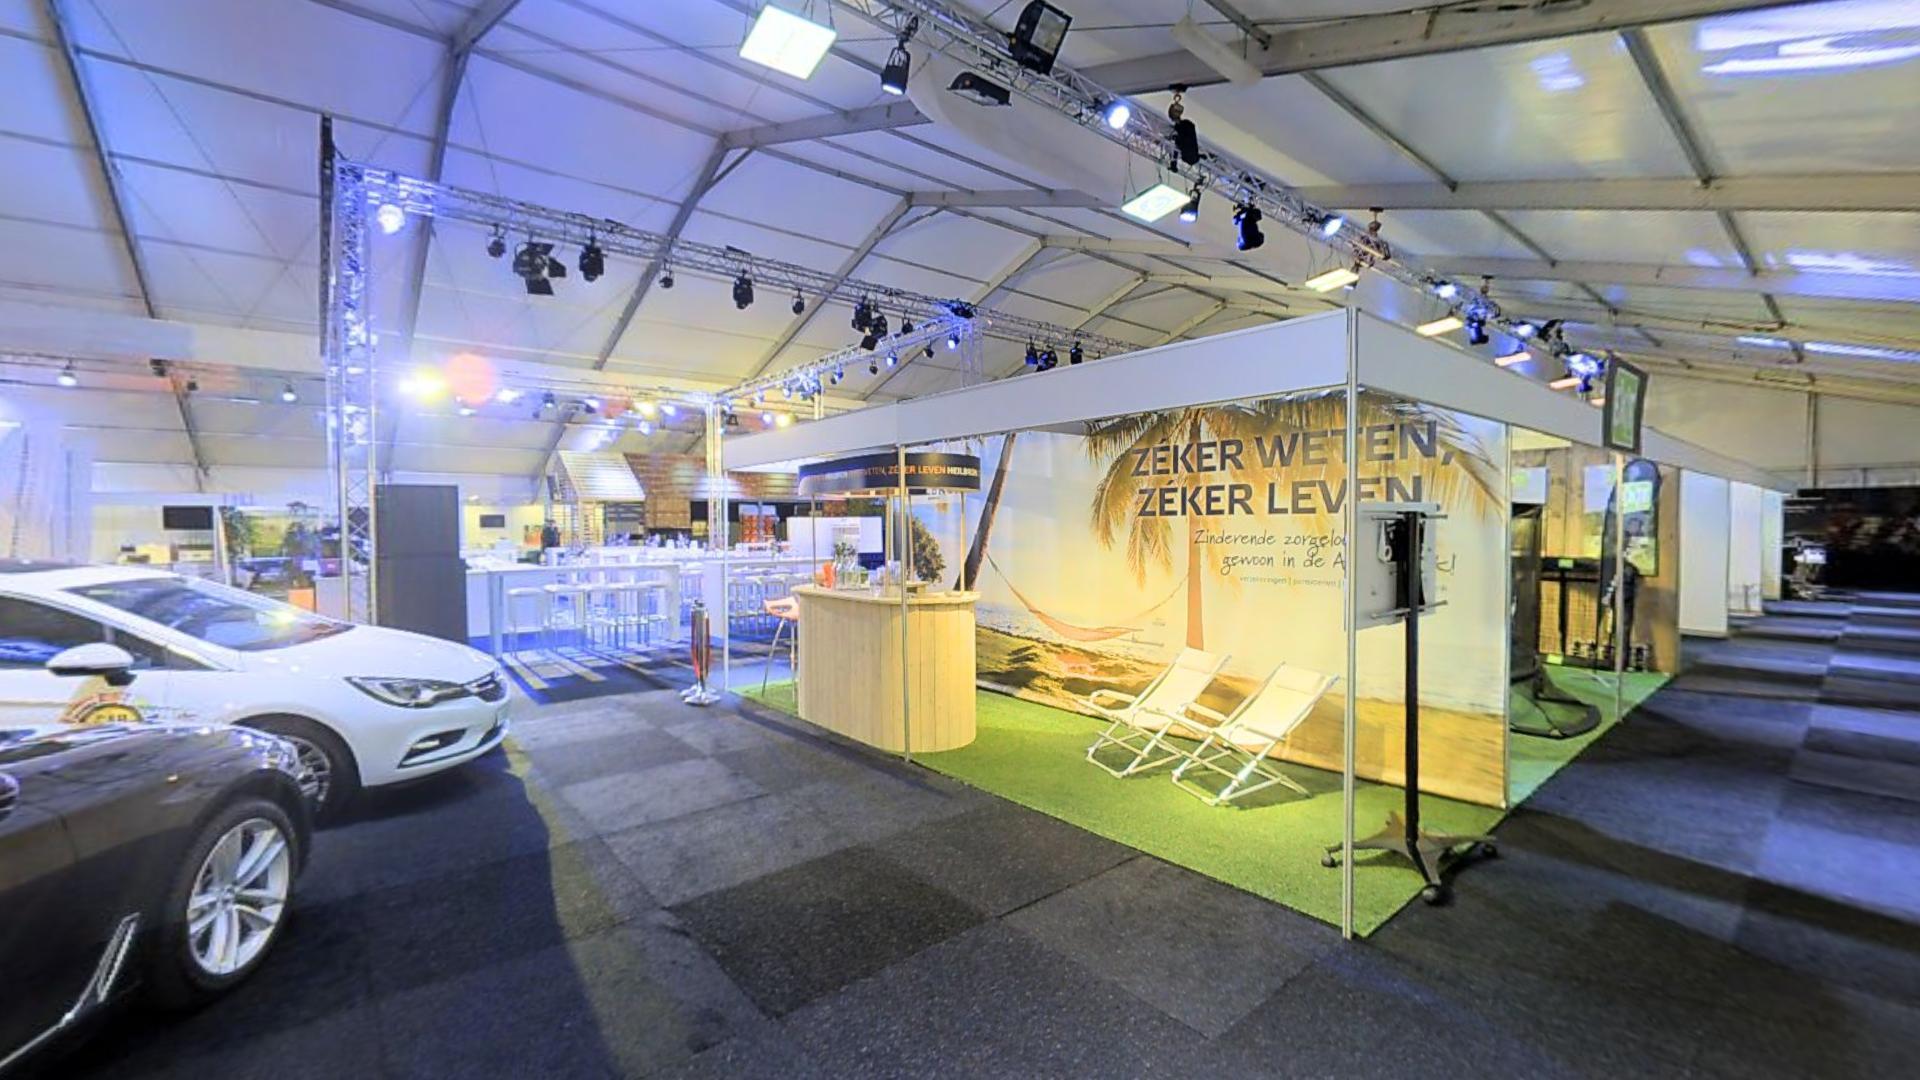 De Graafschap Business Expo